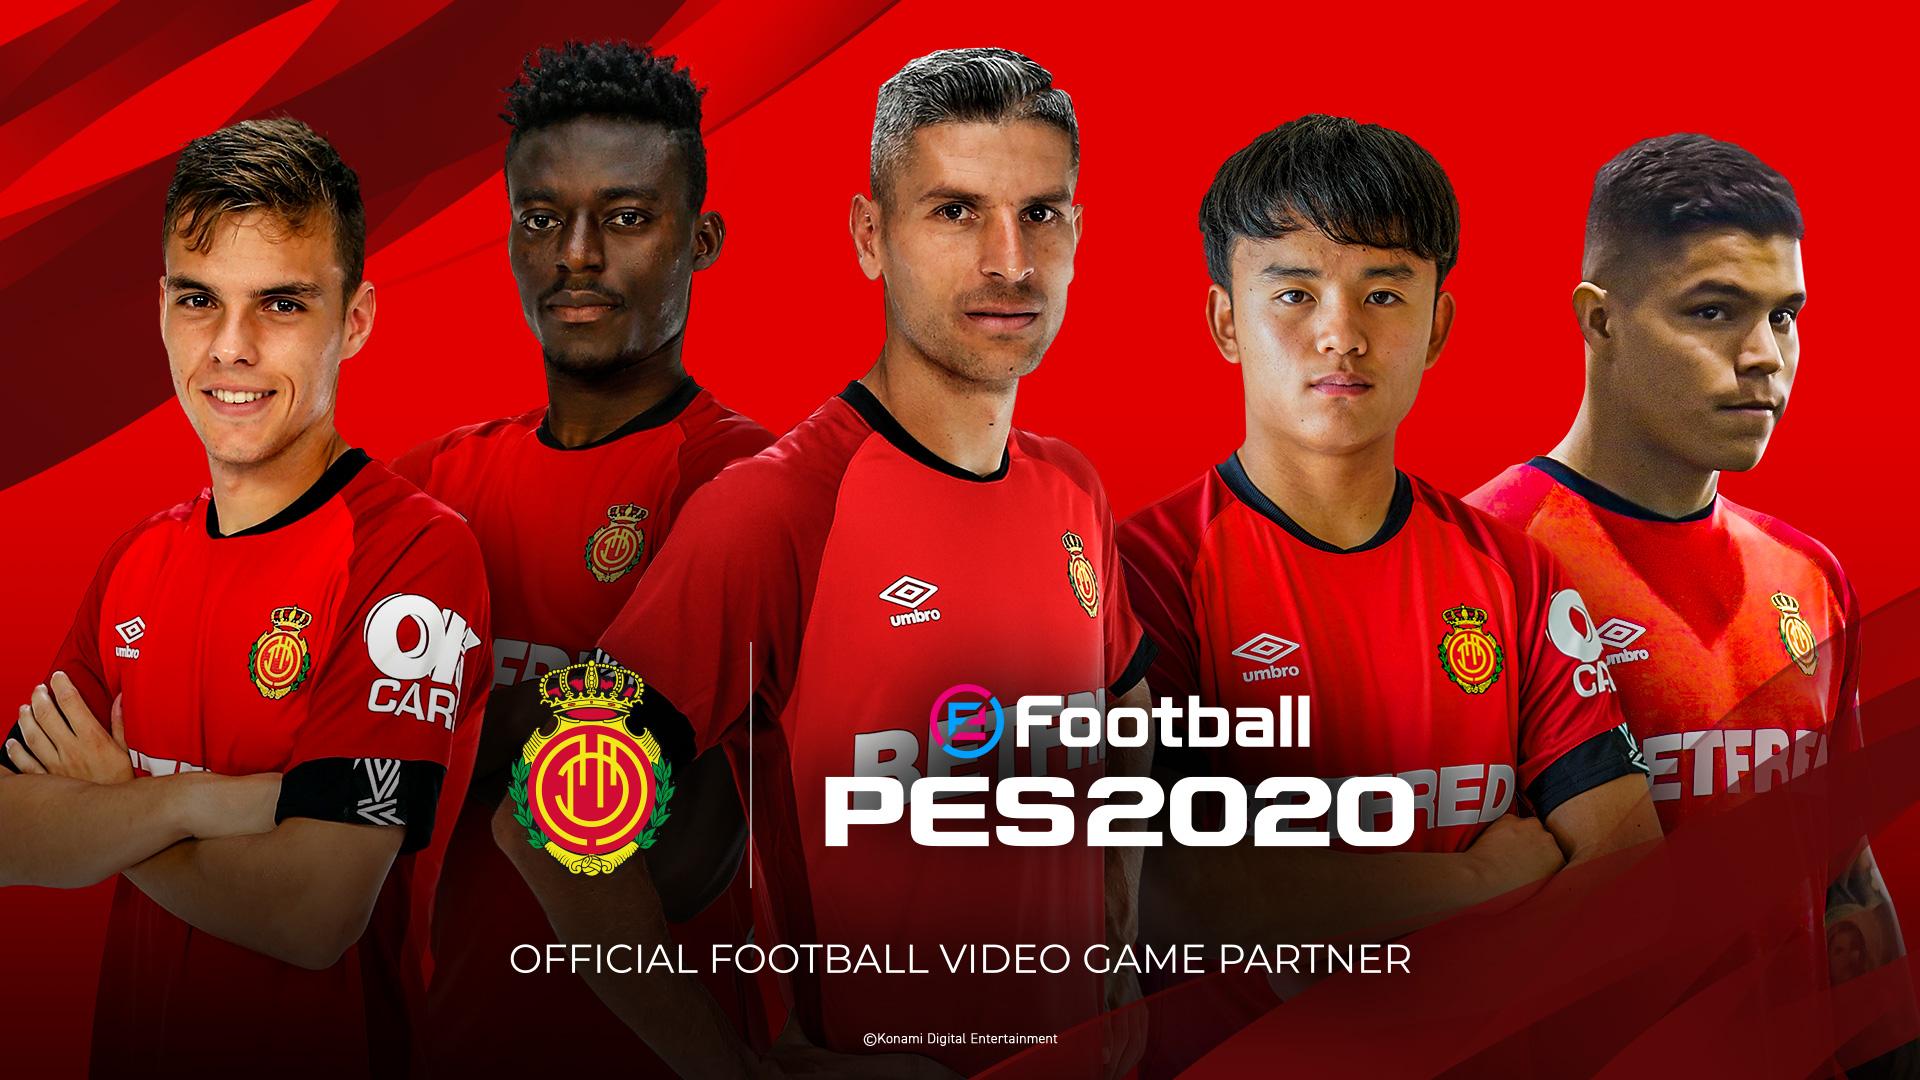 eFootball PES 2020: il Maiorca si aggiunge alle squadre partner thumbnail